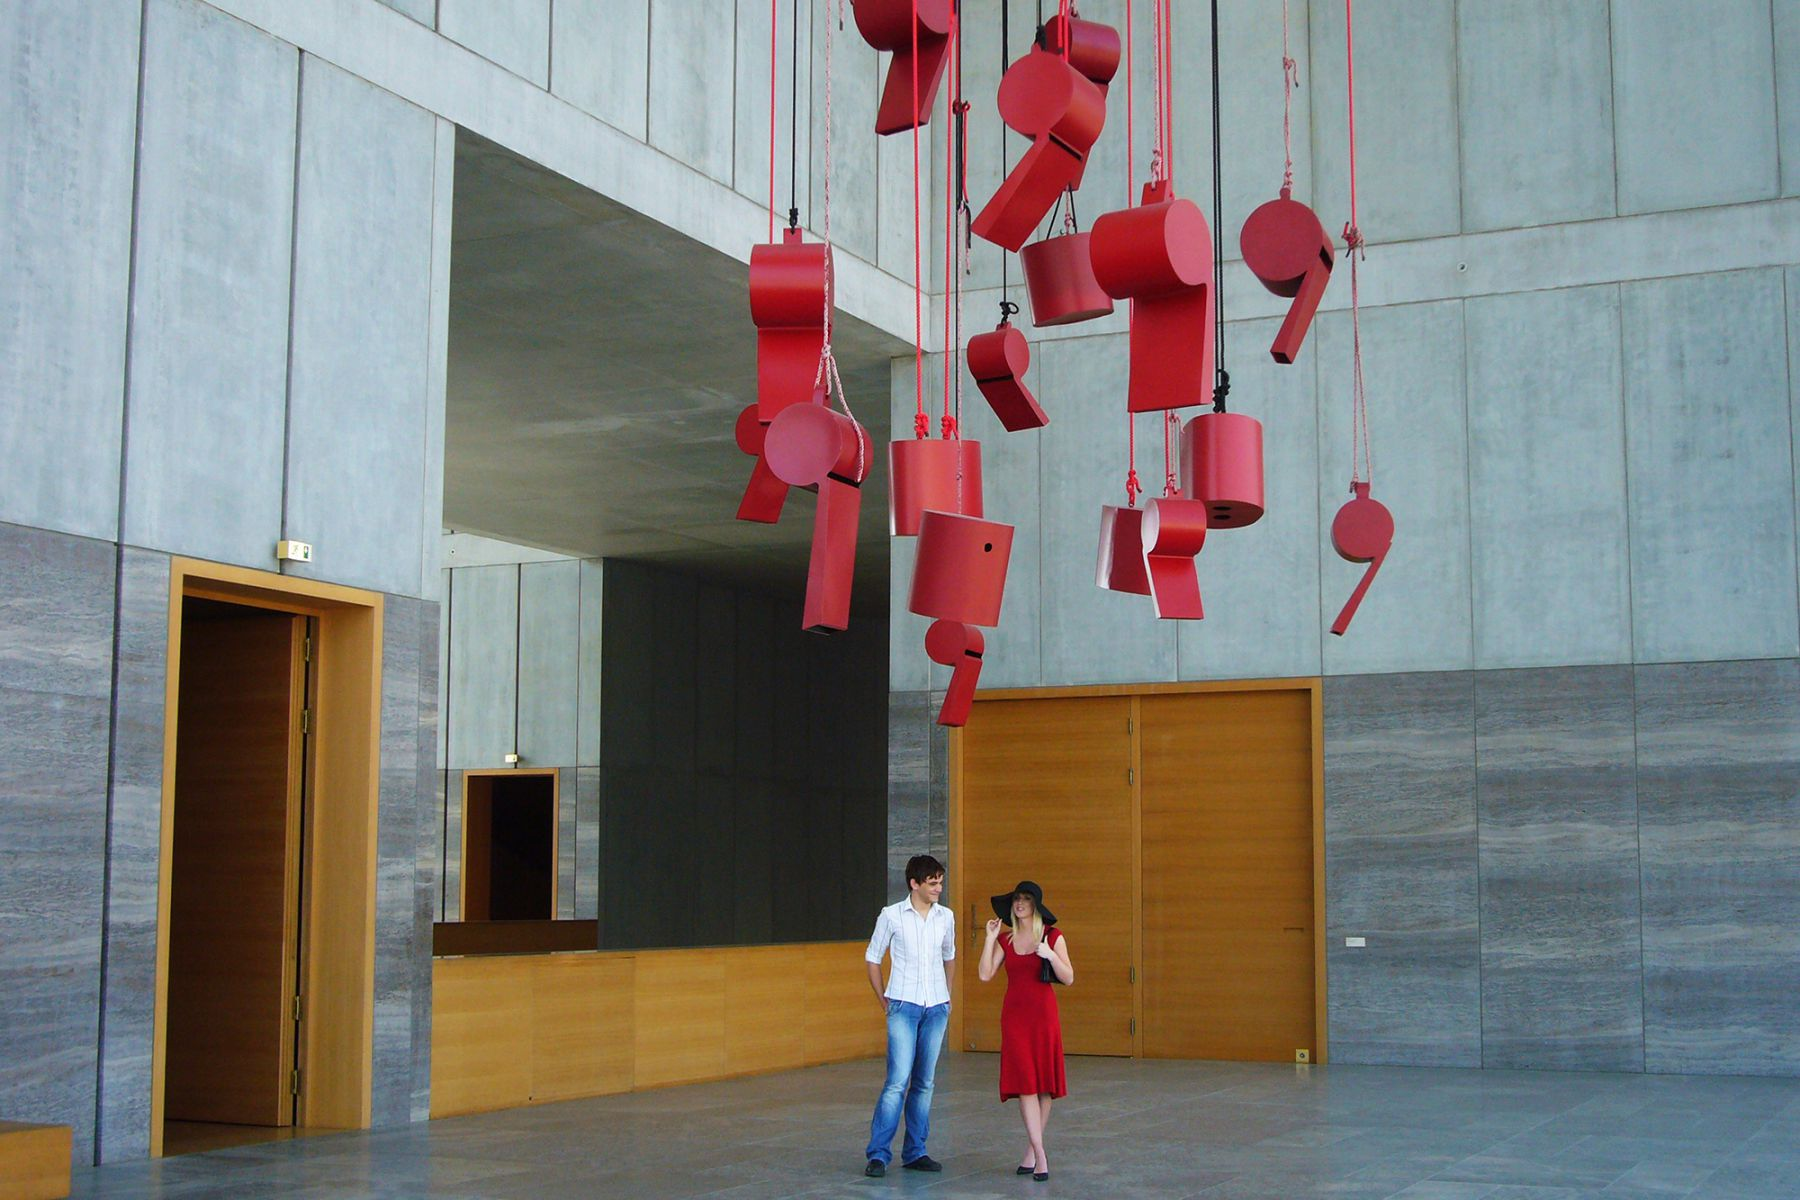 Foto van het Museums der bildende Künste in Leipzig | Foto: LTM Andreas Schmidt